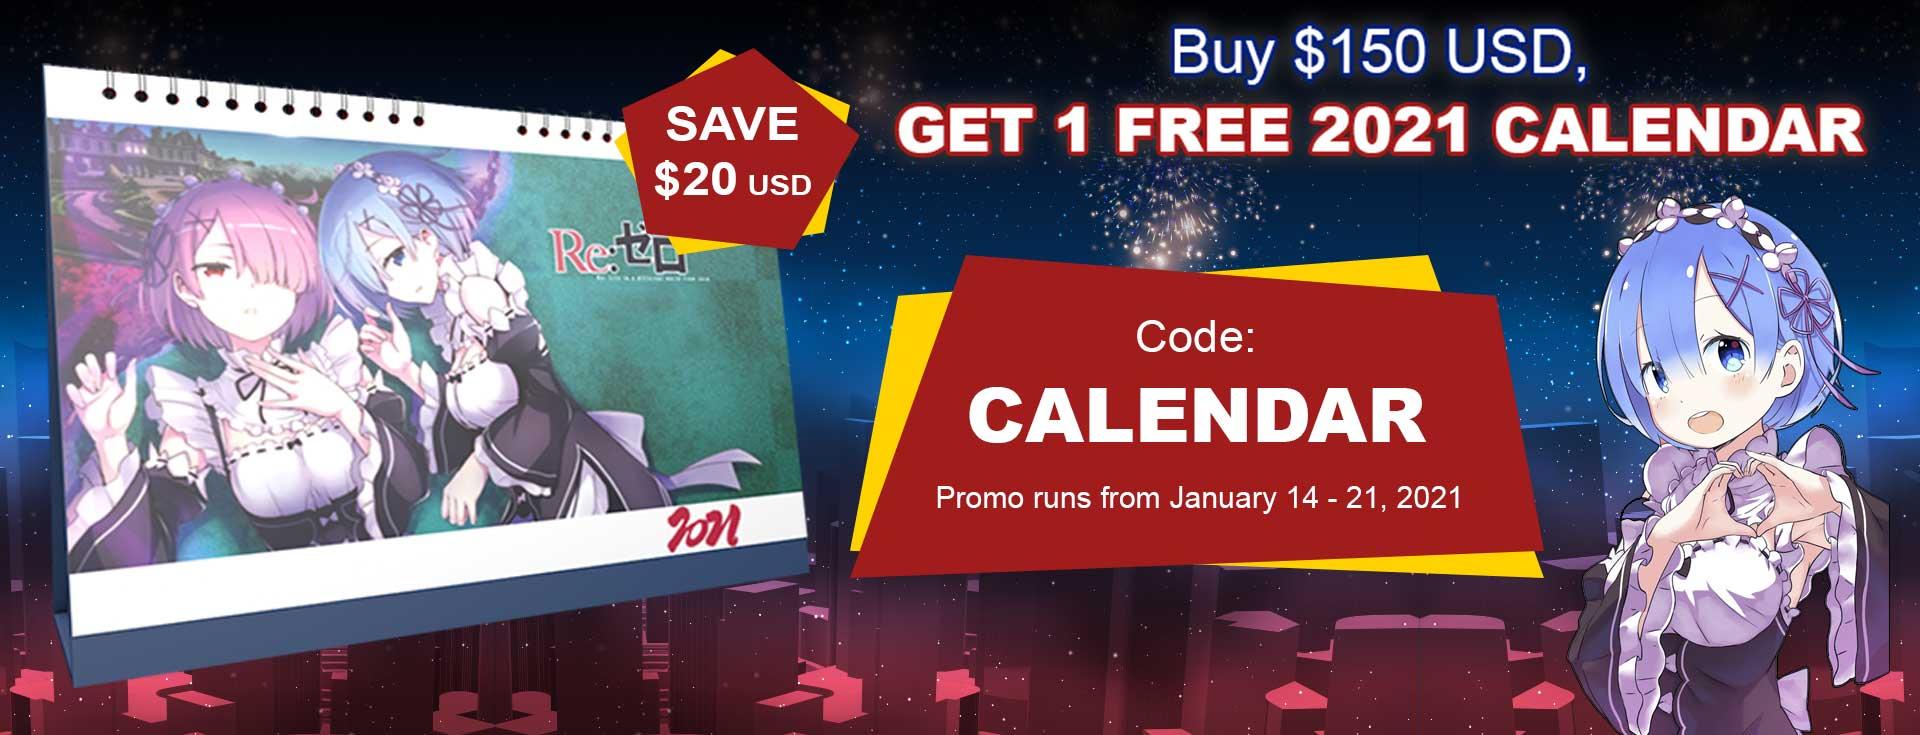 Buy $150, Get 1 Free 2021 Calendar